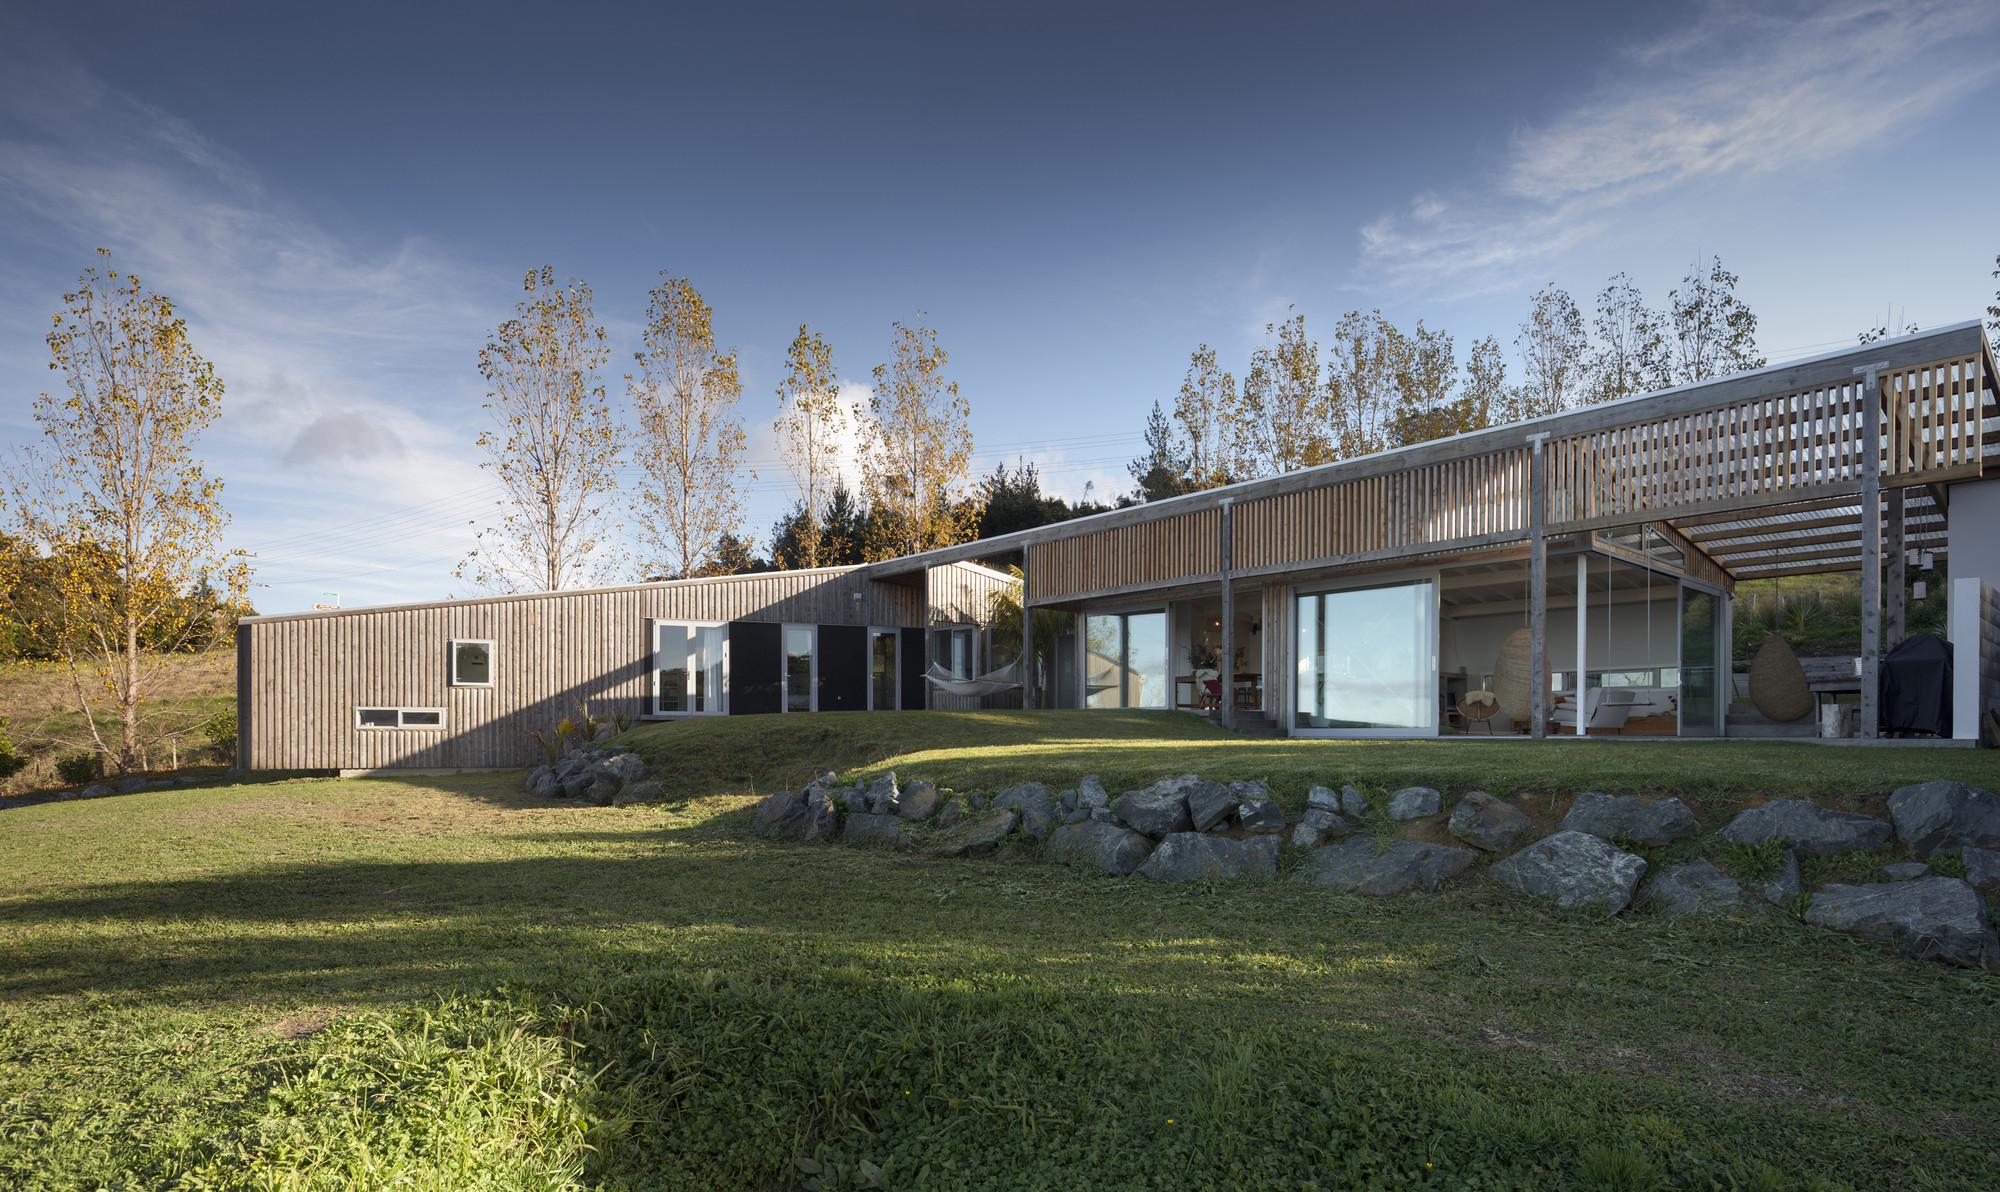 Brick Bay House / Glamuzina Paterson Architects, Courtesy of Glamuzina Paterson Architects